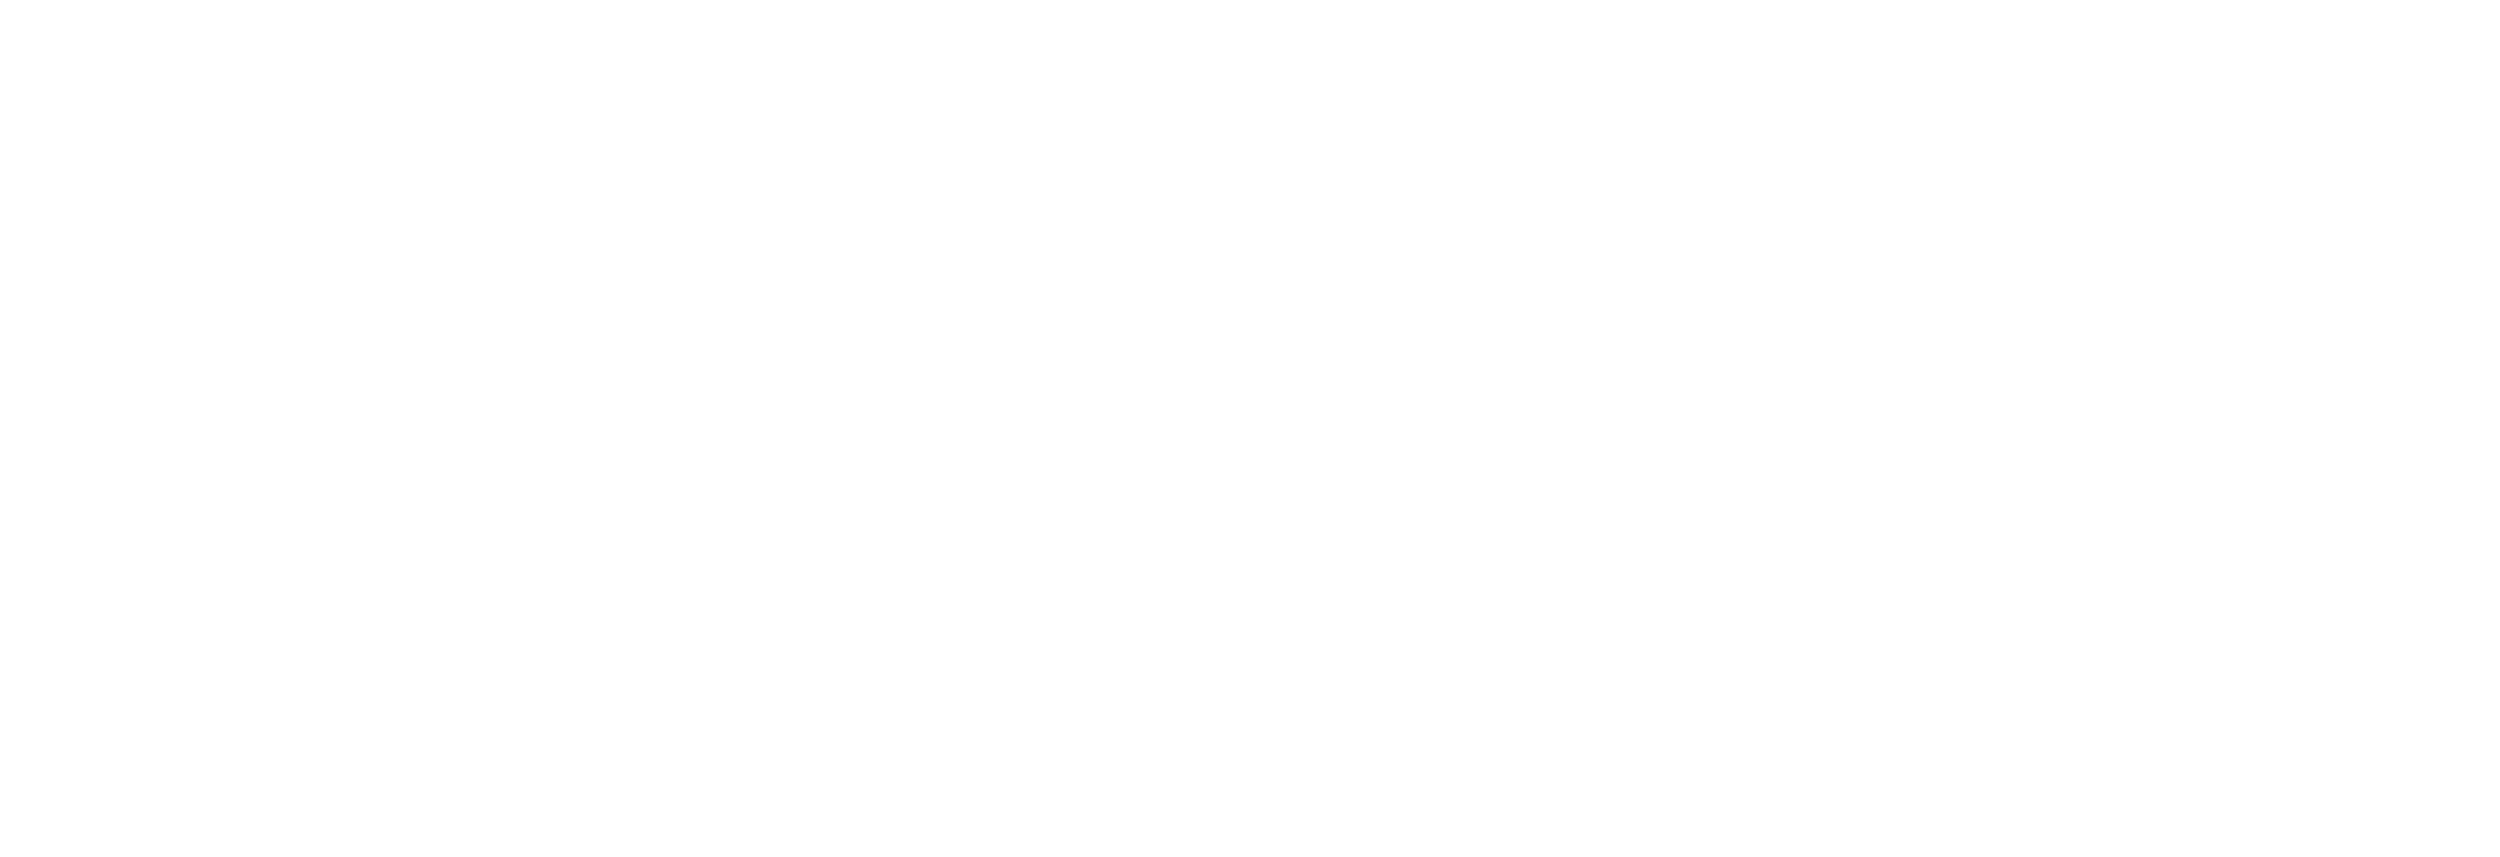 BODY CT/MRI 2021